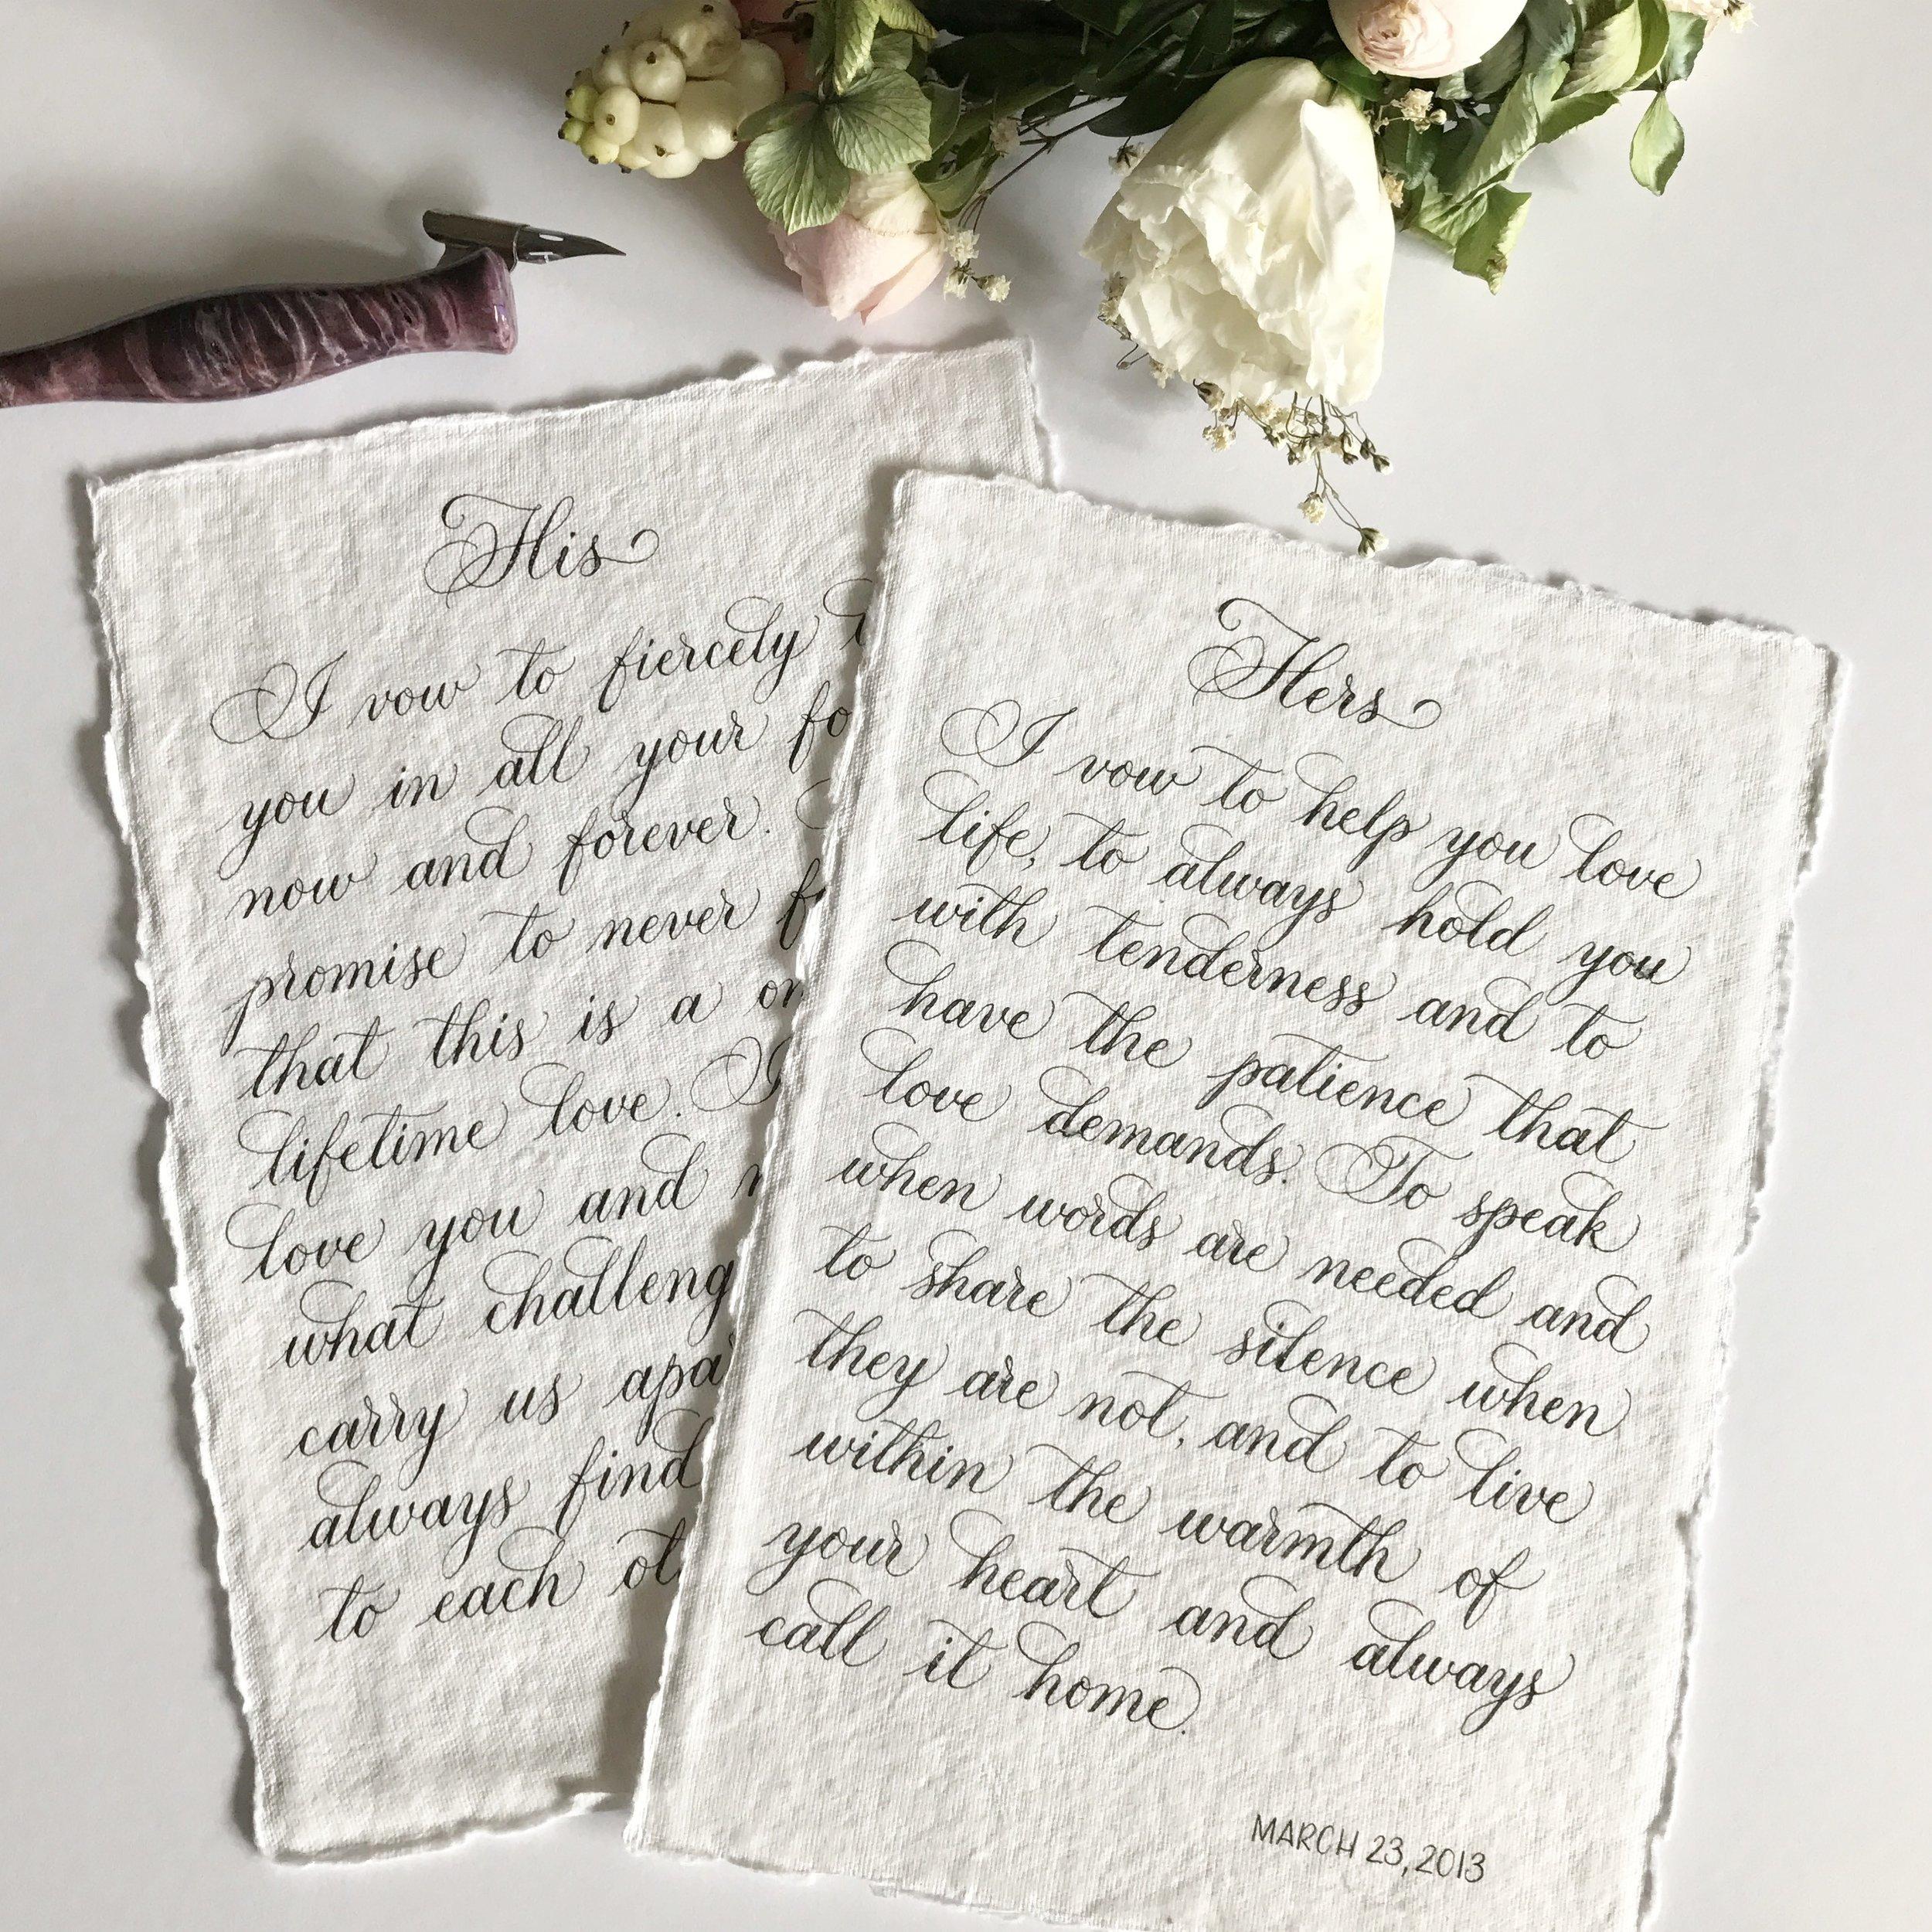 Weddings vows on handmade paper